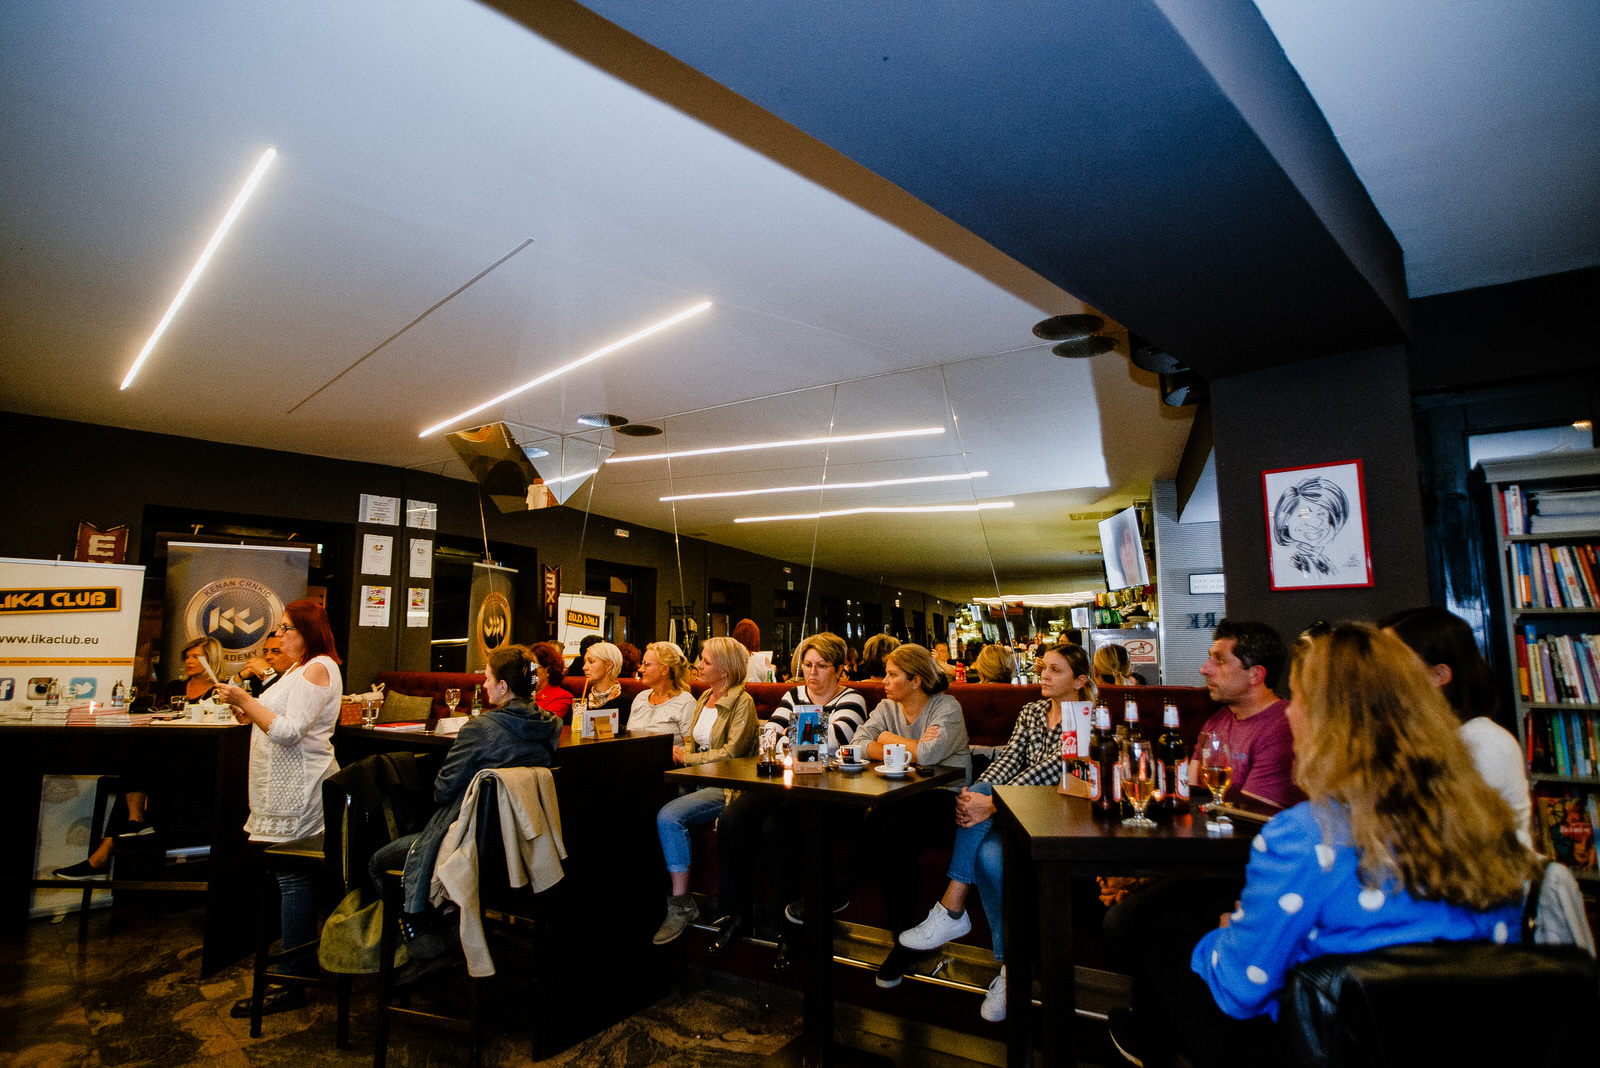 likaclub_otočac_book-caffe-paradisso_kenan-crnkić_2019-19